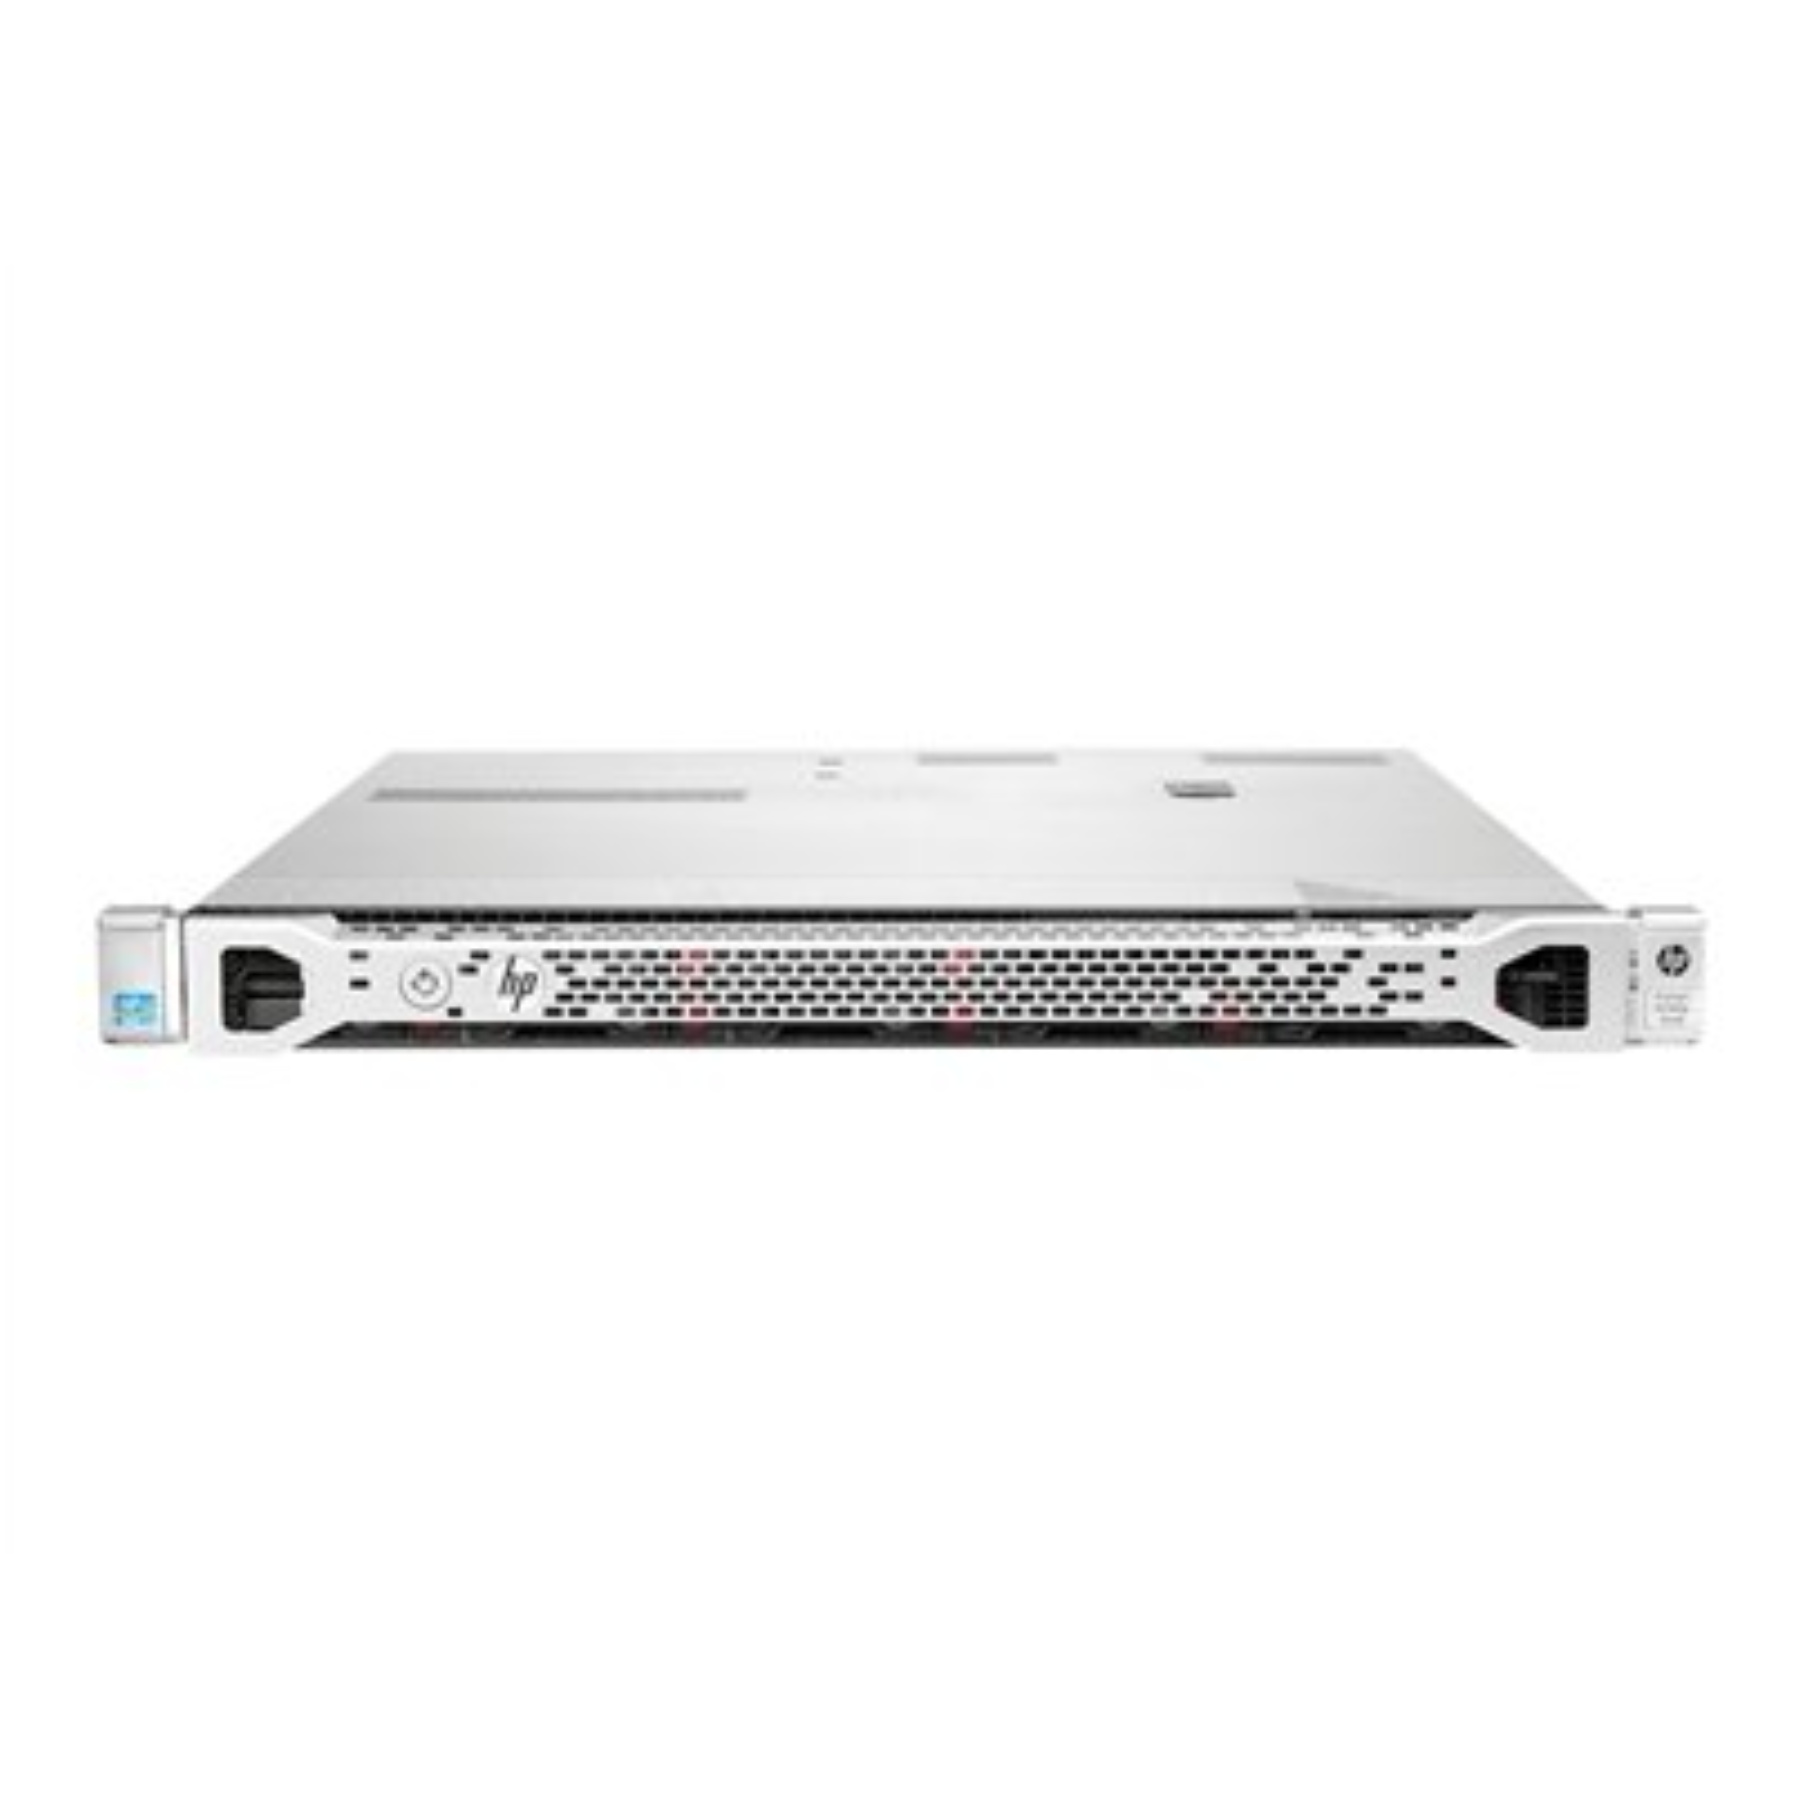 HPE 670853-S01 HP ProLiant DL380p Gen8 E5-2660 2.20GHz 8-core 2P 32GB-R P42